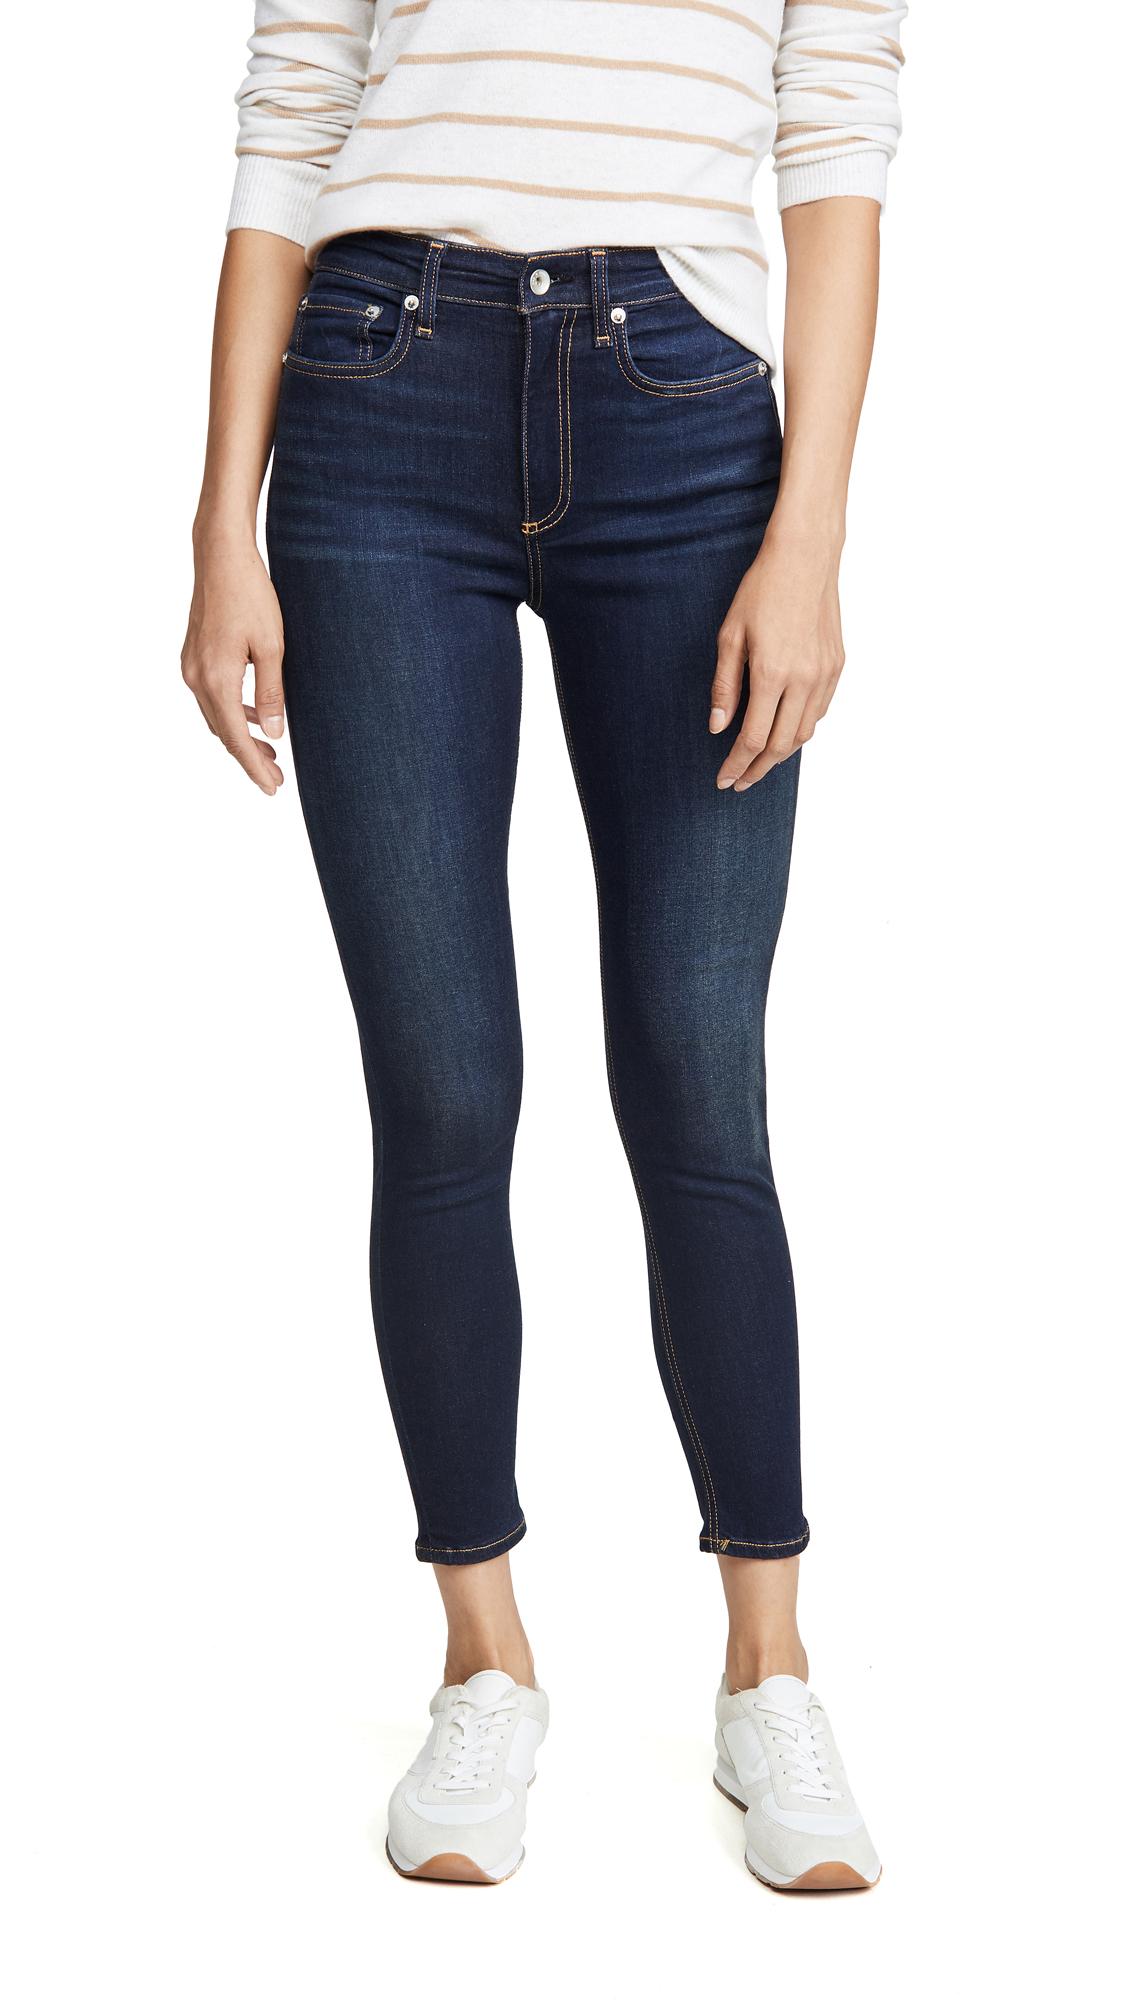 Buy Rag & Bone/JEAN online - photo of Rag & Bone/JEAN Nina High Rise Ankle Skinny Jeans